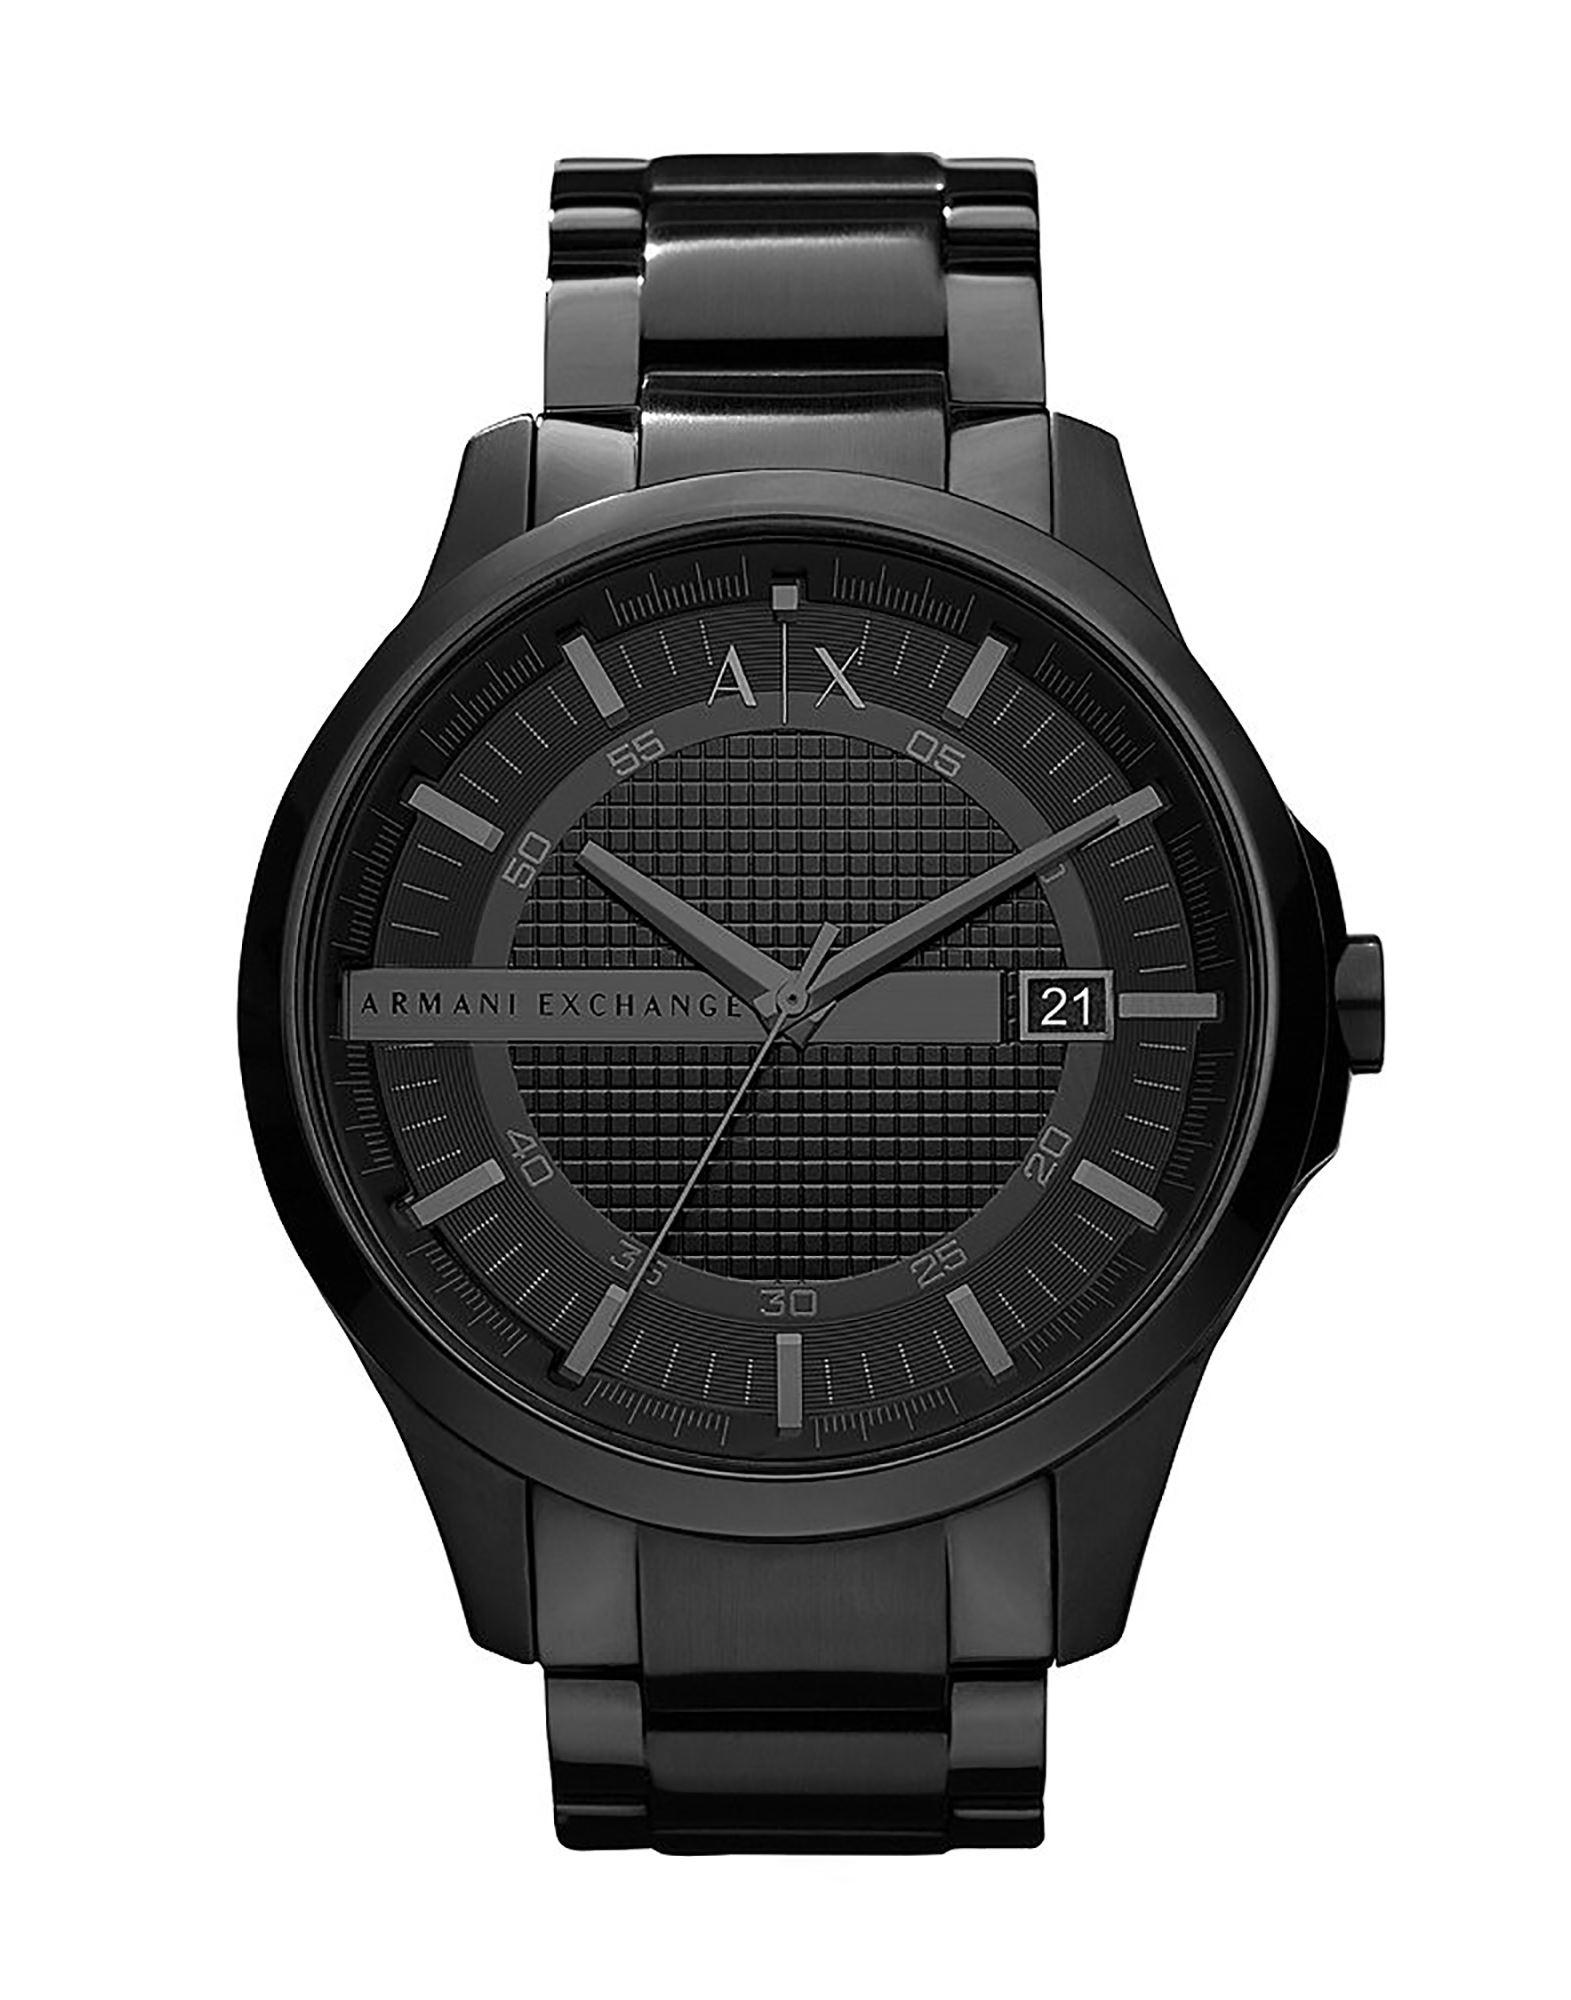 ARMANI EXCHANGE メンズ 腕時計 ブラック ステンレススチール